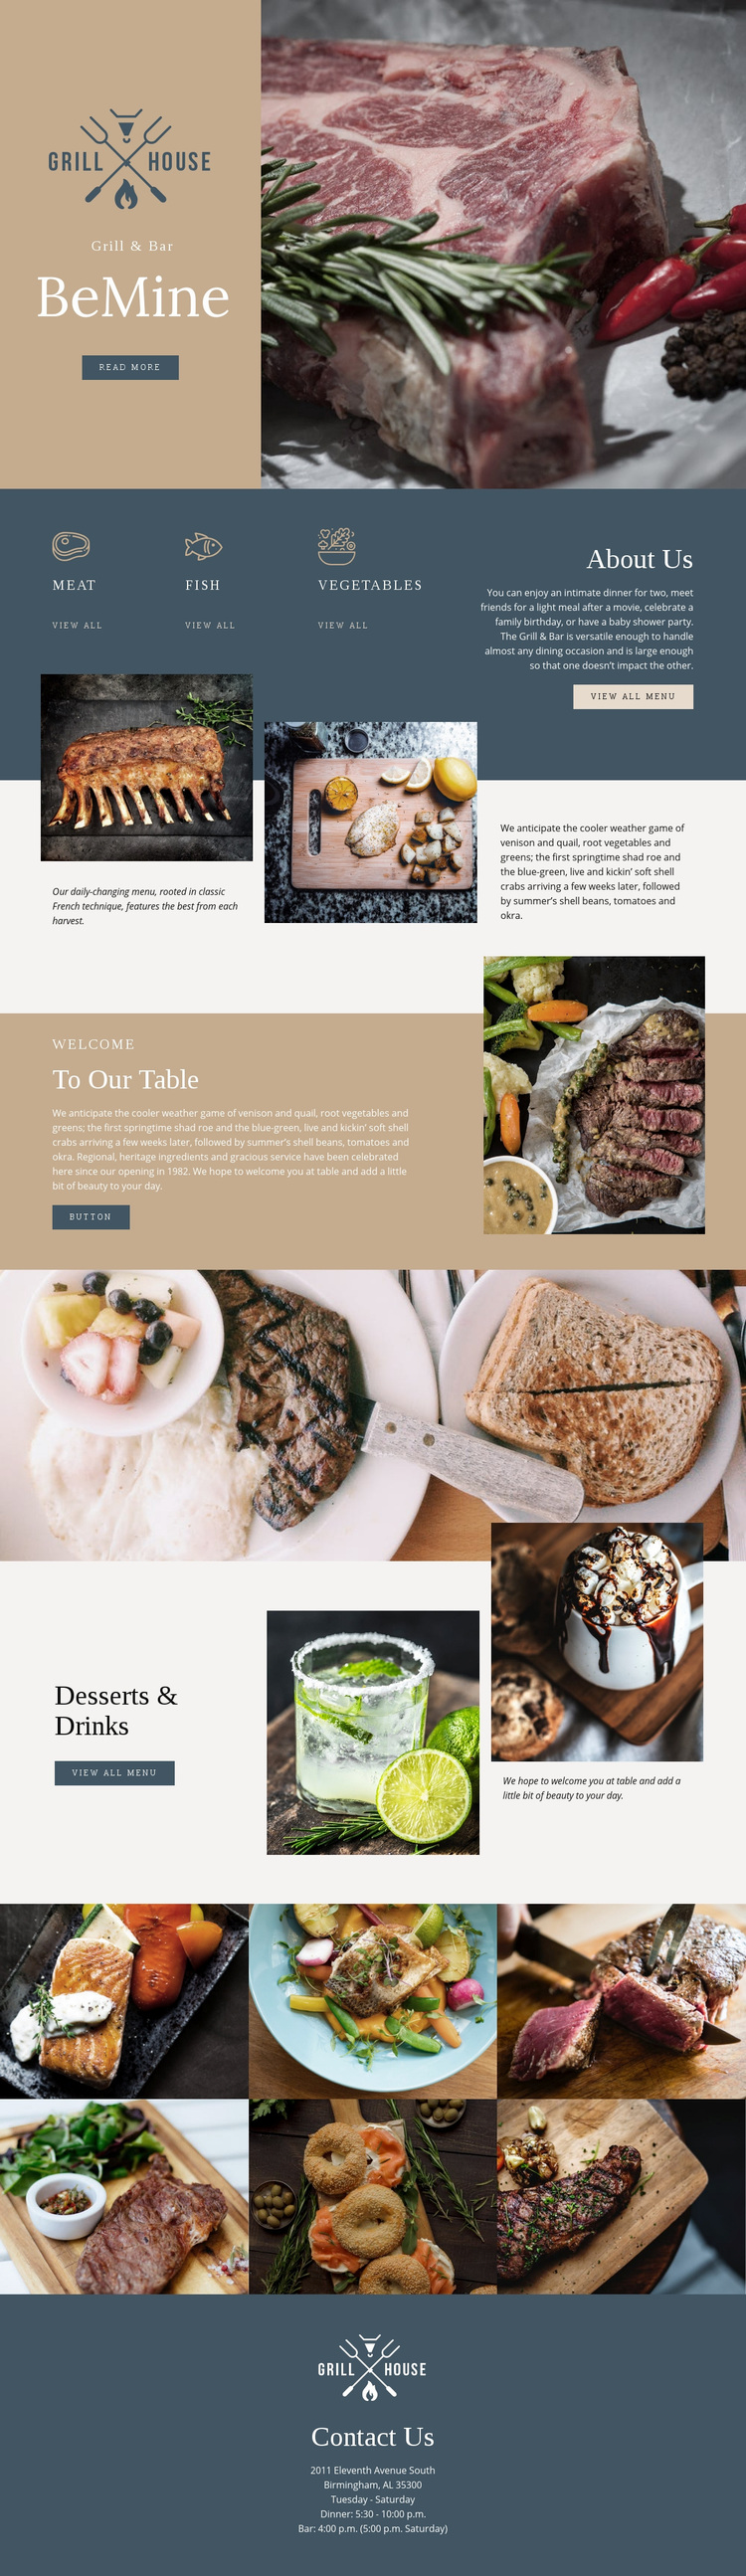 Finest grill house restaurant Web Page Designer